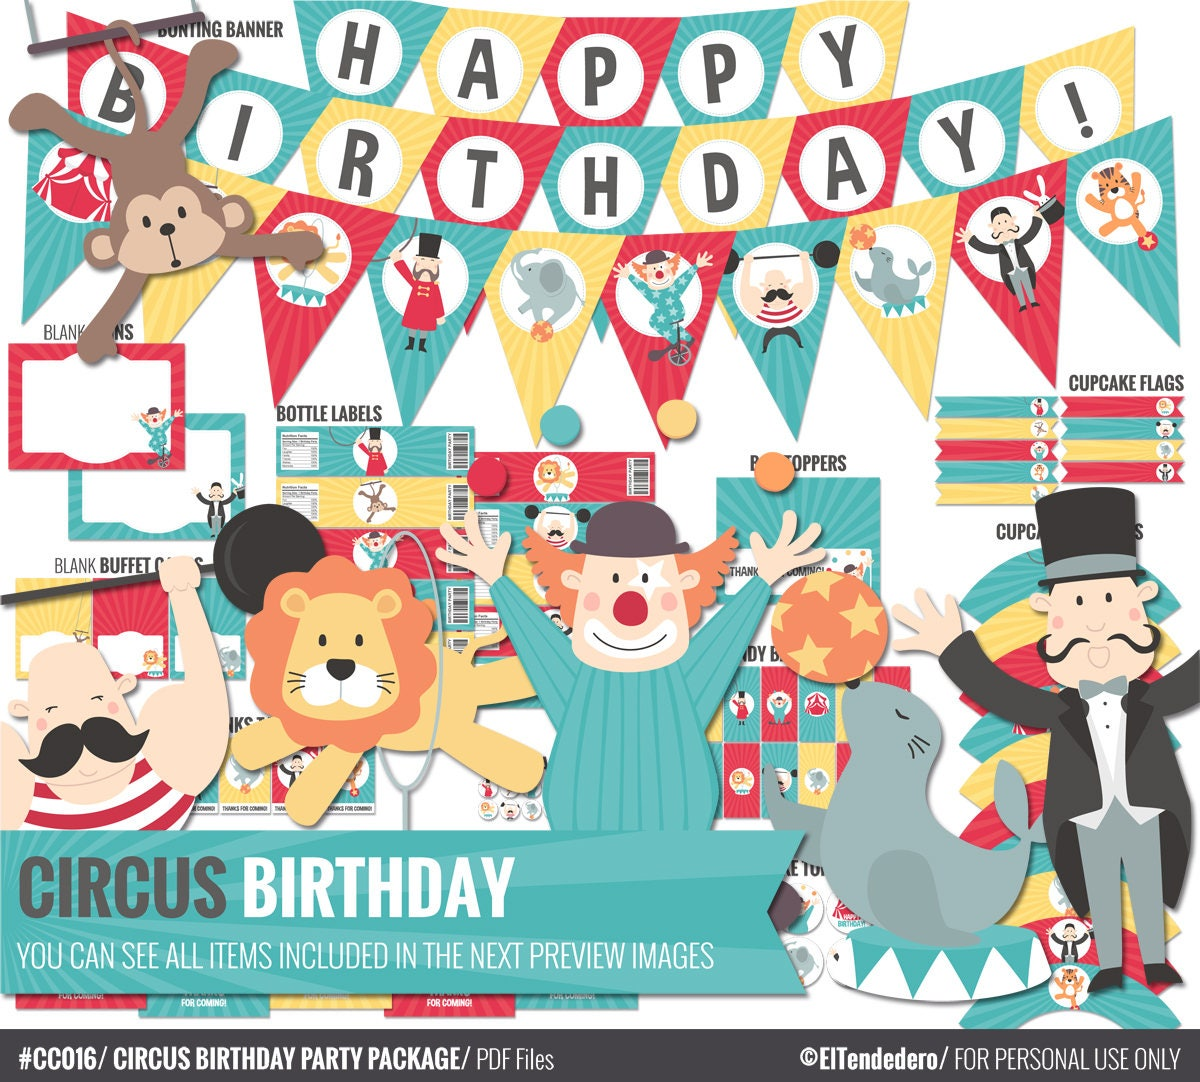 theme party x invite photography ideas decorations invitations interior fabulous circus decor kb carnival